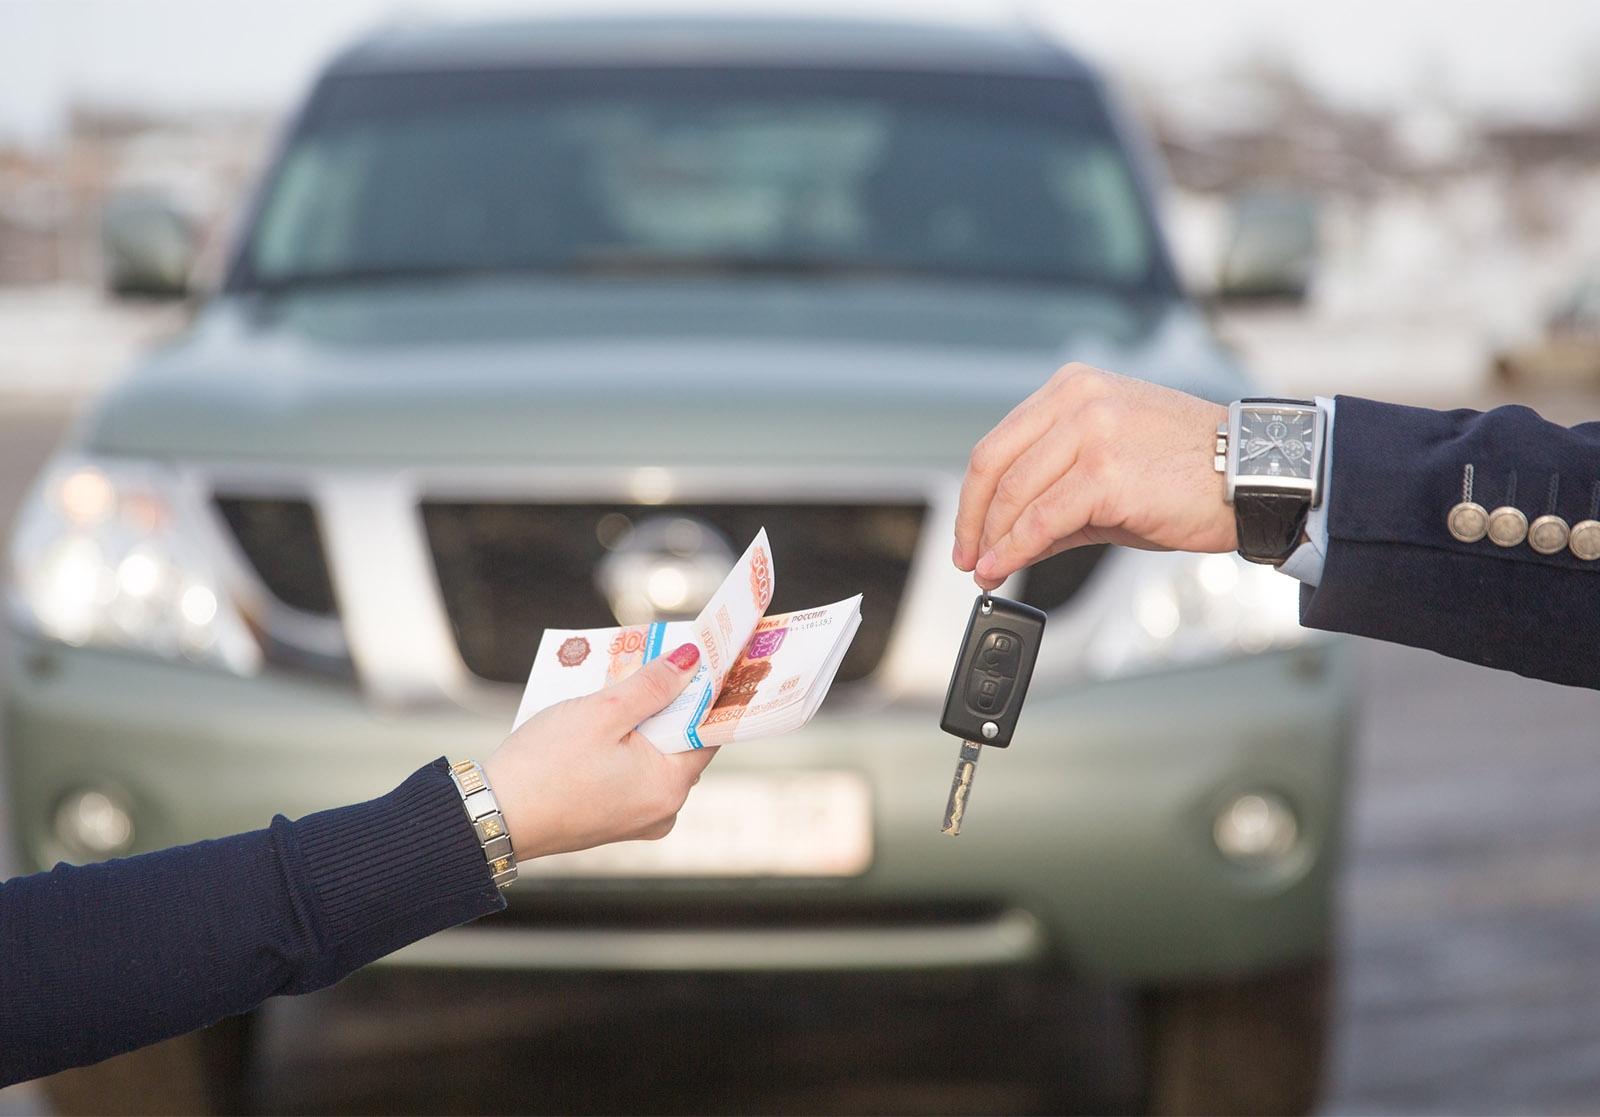 Кредит под залог автомобиля, взять кредит под залог авто